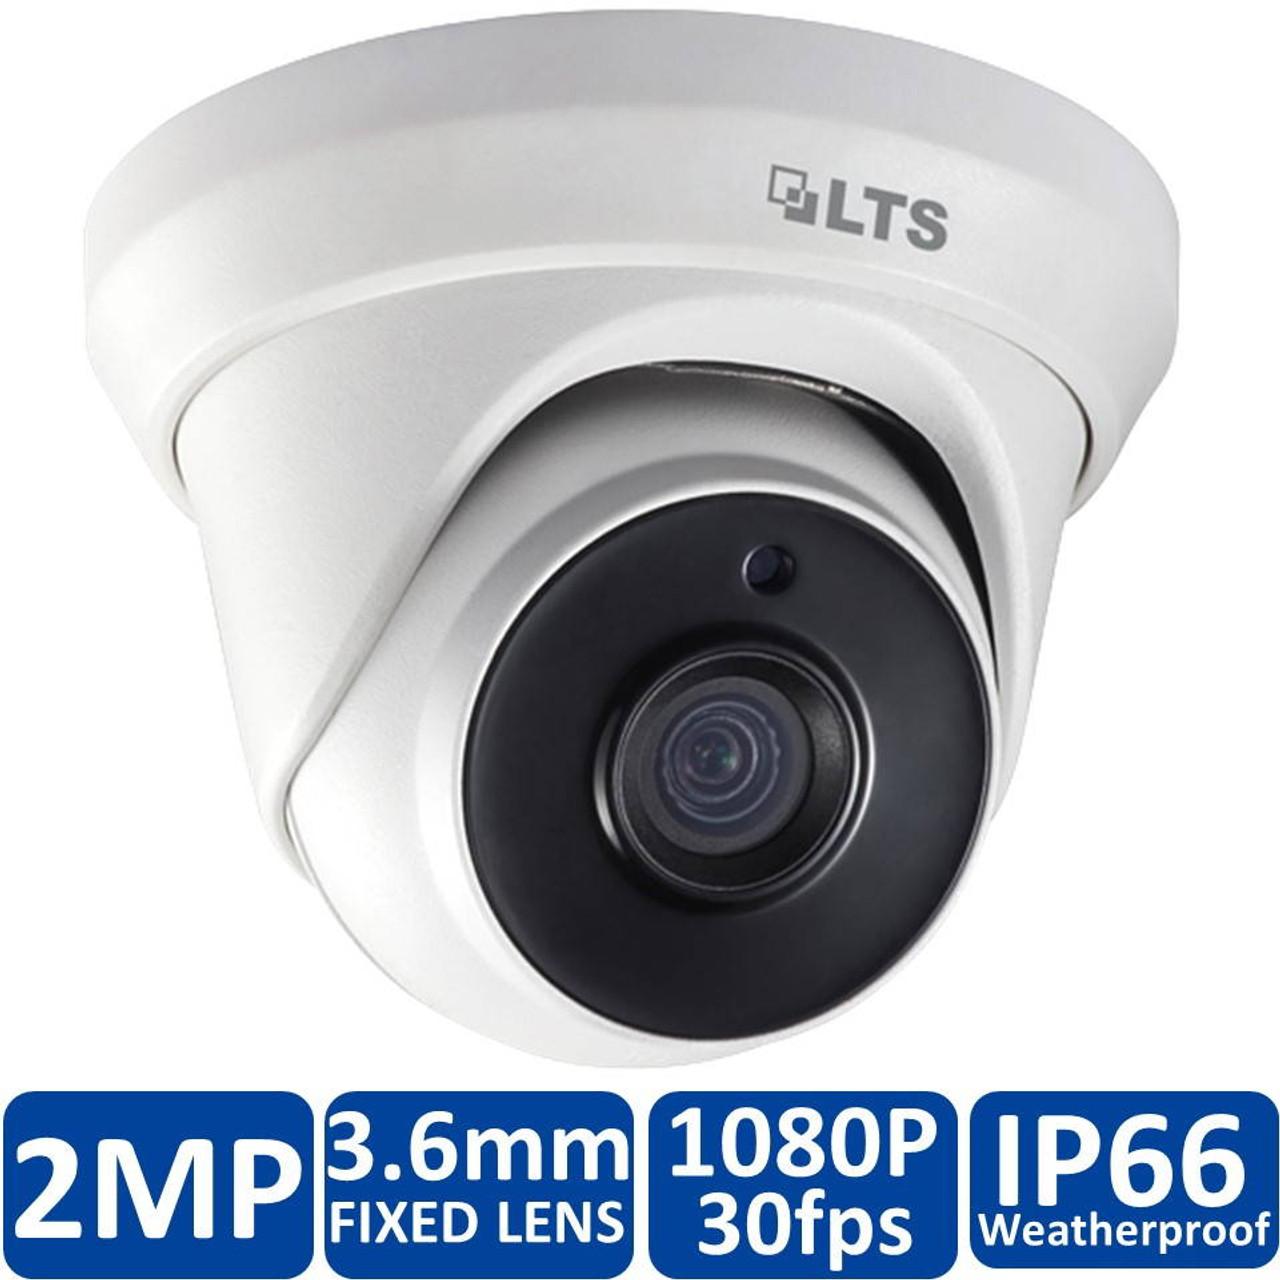 Black CMHT2023RB LTS Platinum HD-TVI Varifocal Turret Camera 2.1MP